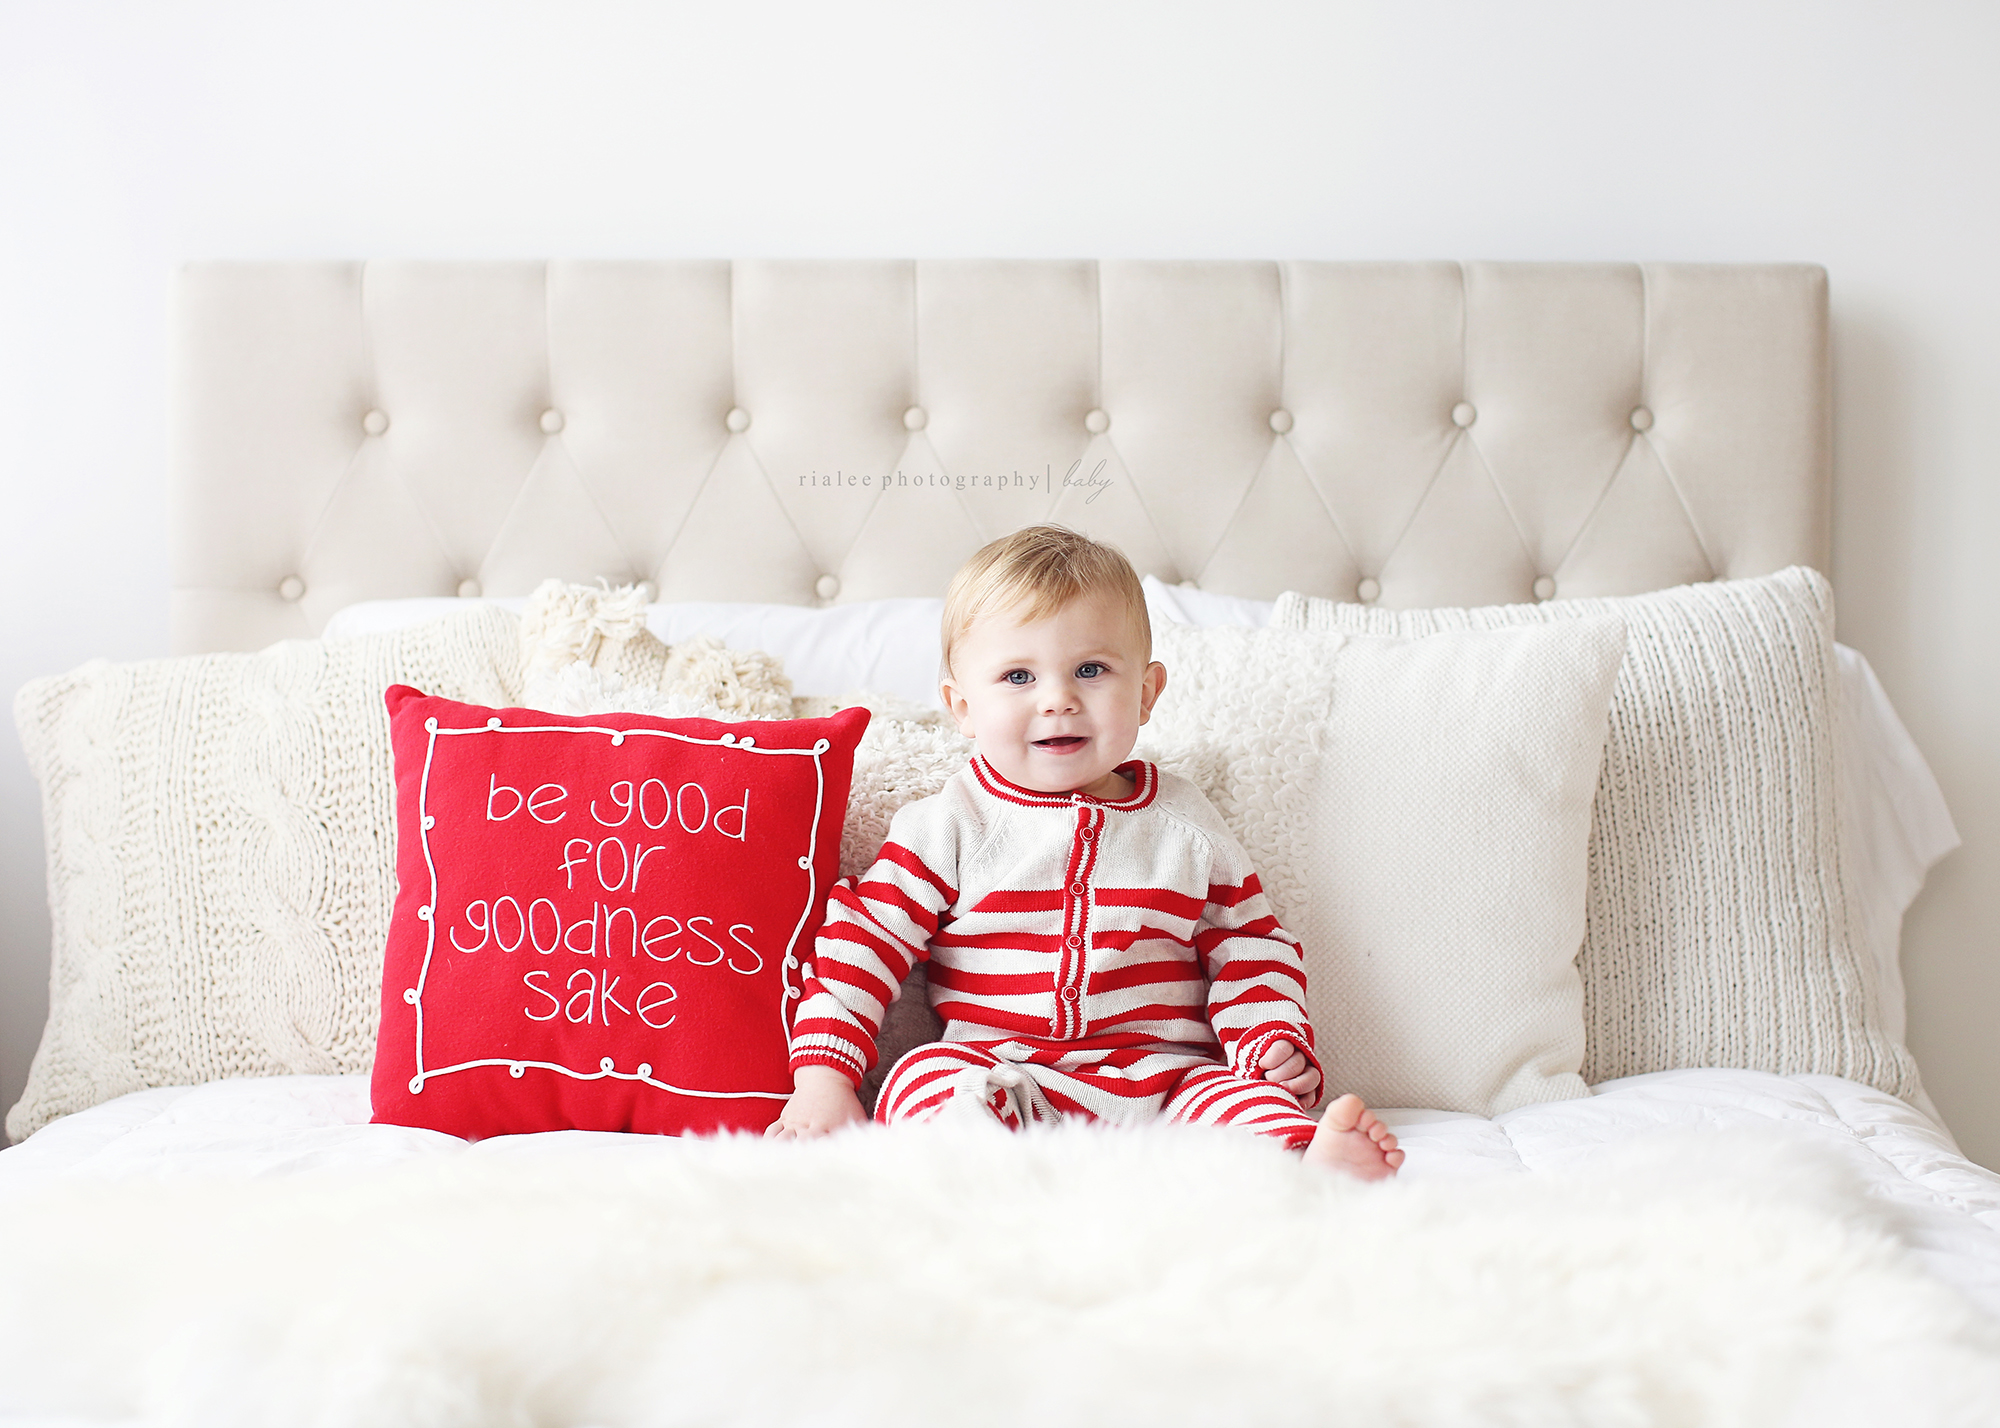 babychristmasphotos.jpg